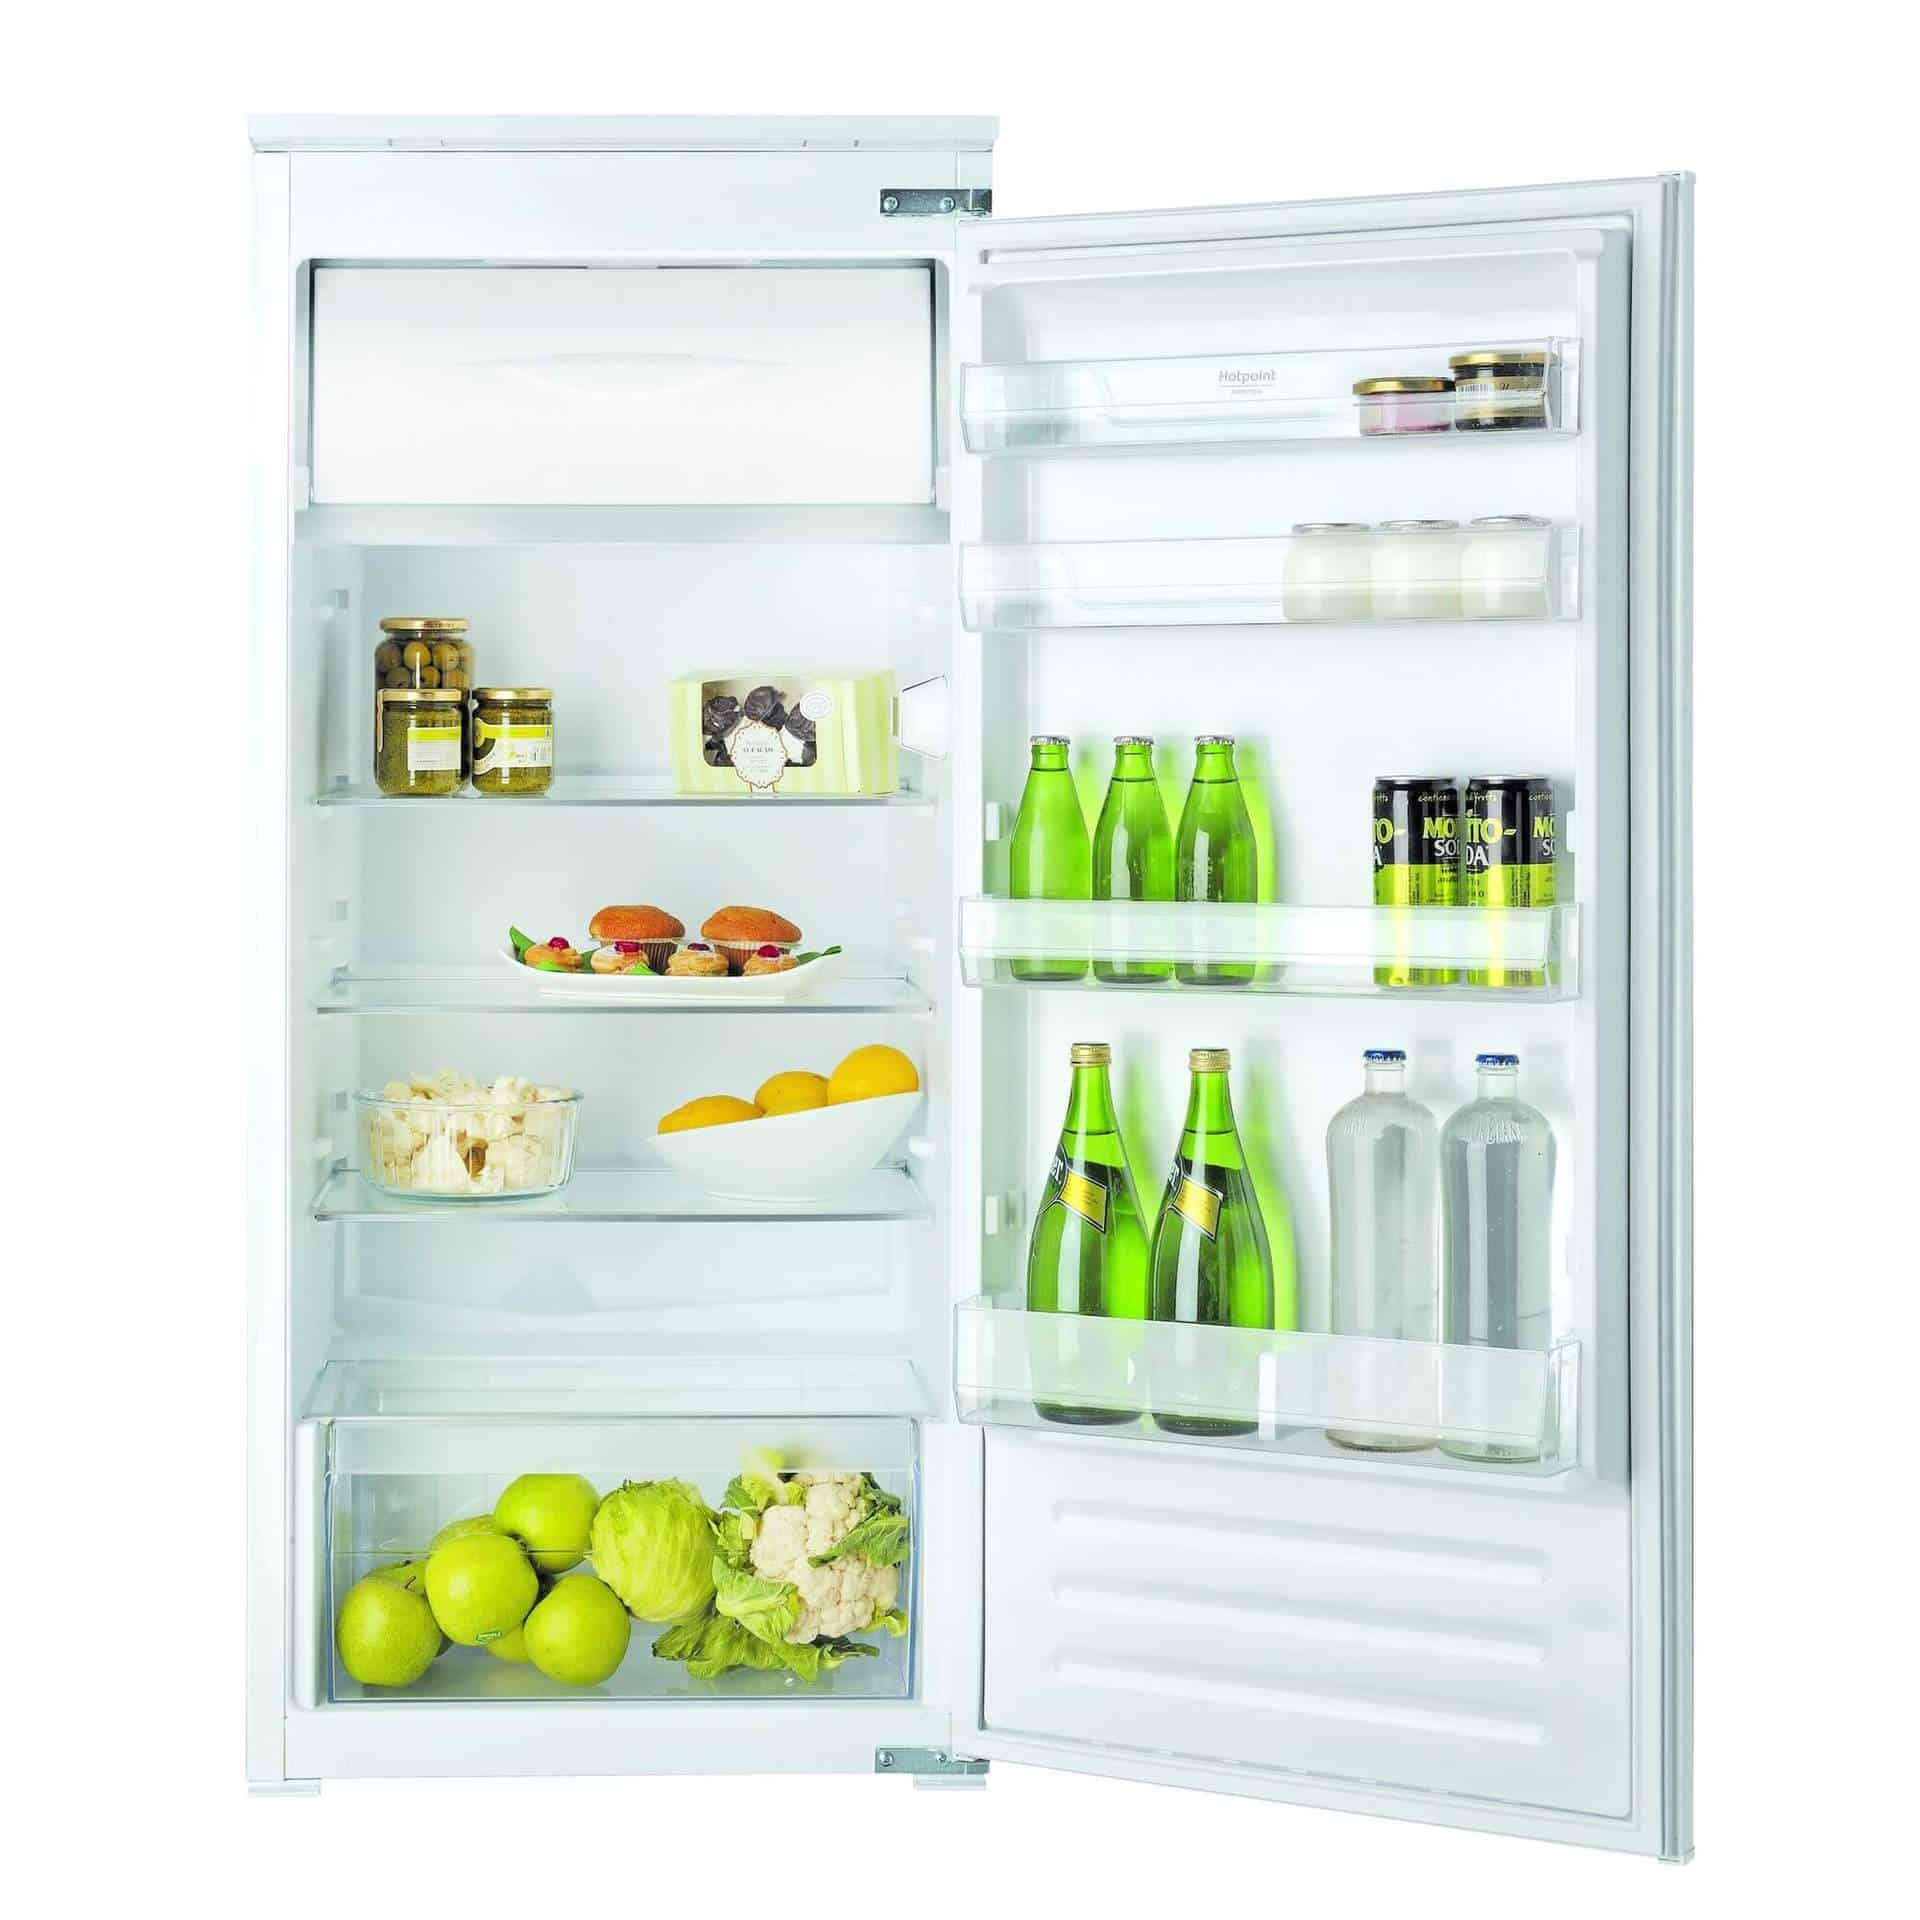 Hotpoint SZ 12 A1 D/HA - frigider cu pret accesibil